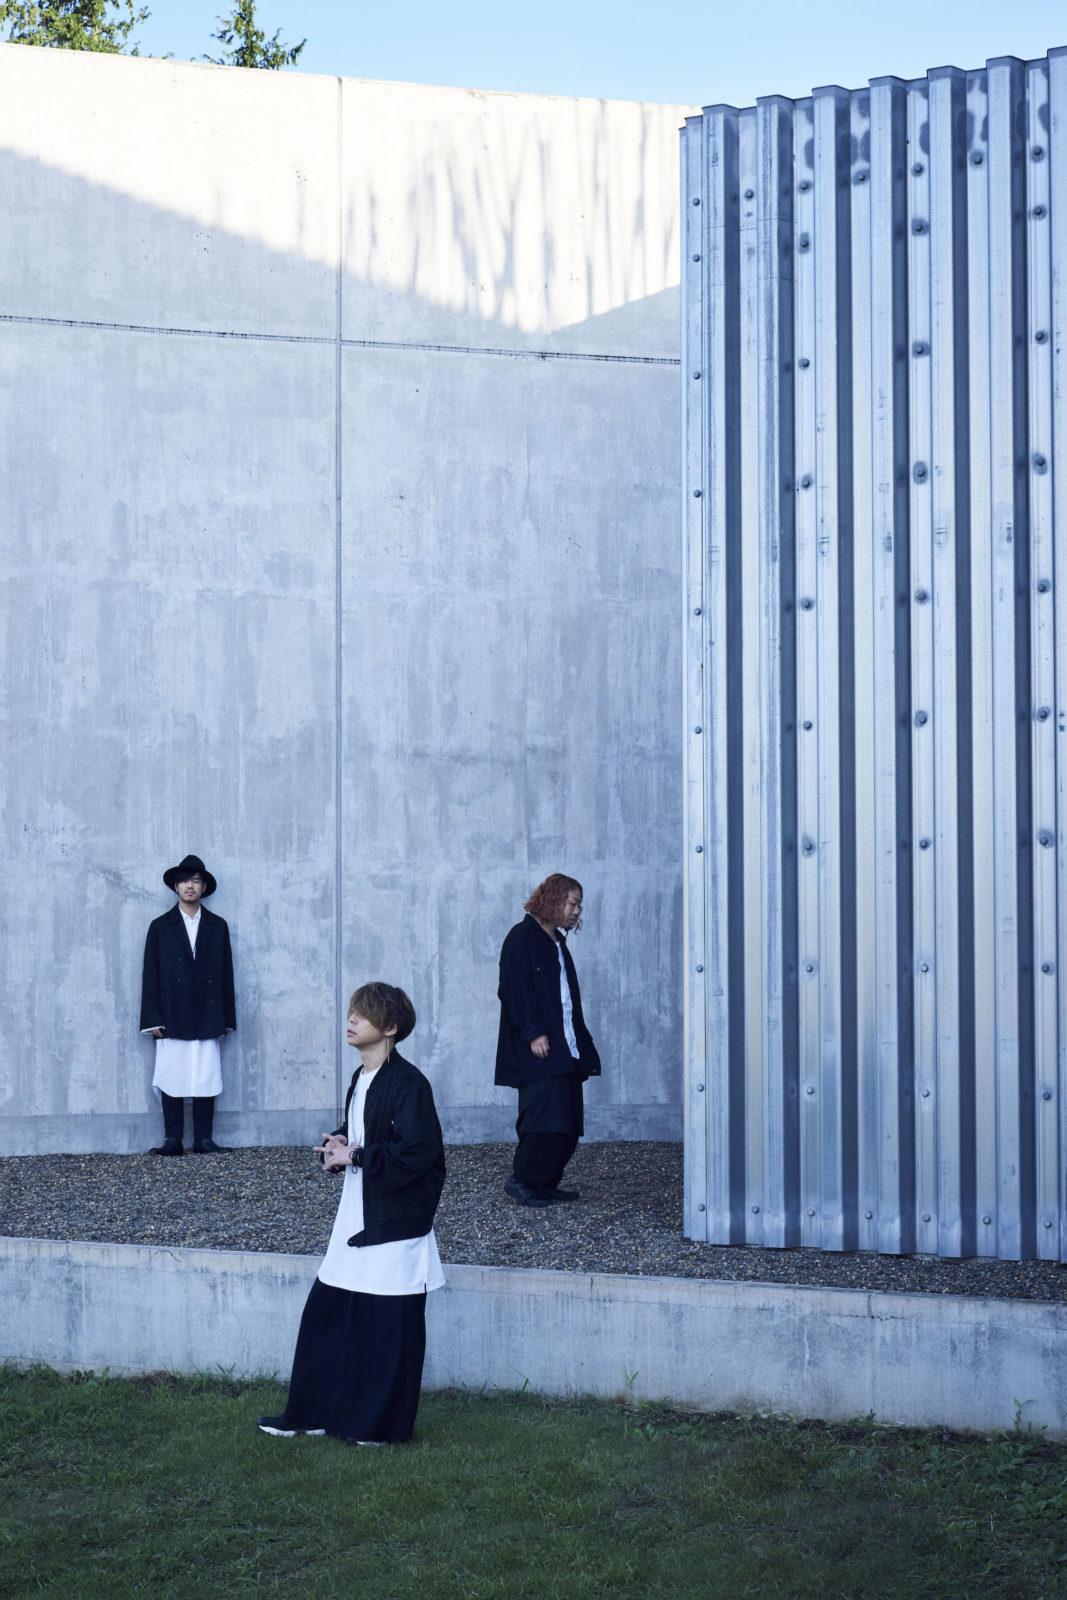 CIVILIAN 待望のファーストアルバム「eve」のリリース発表サムネイル画像